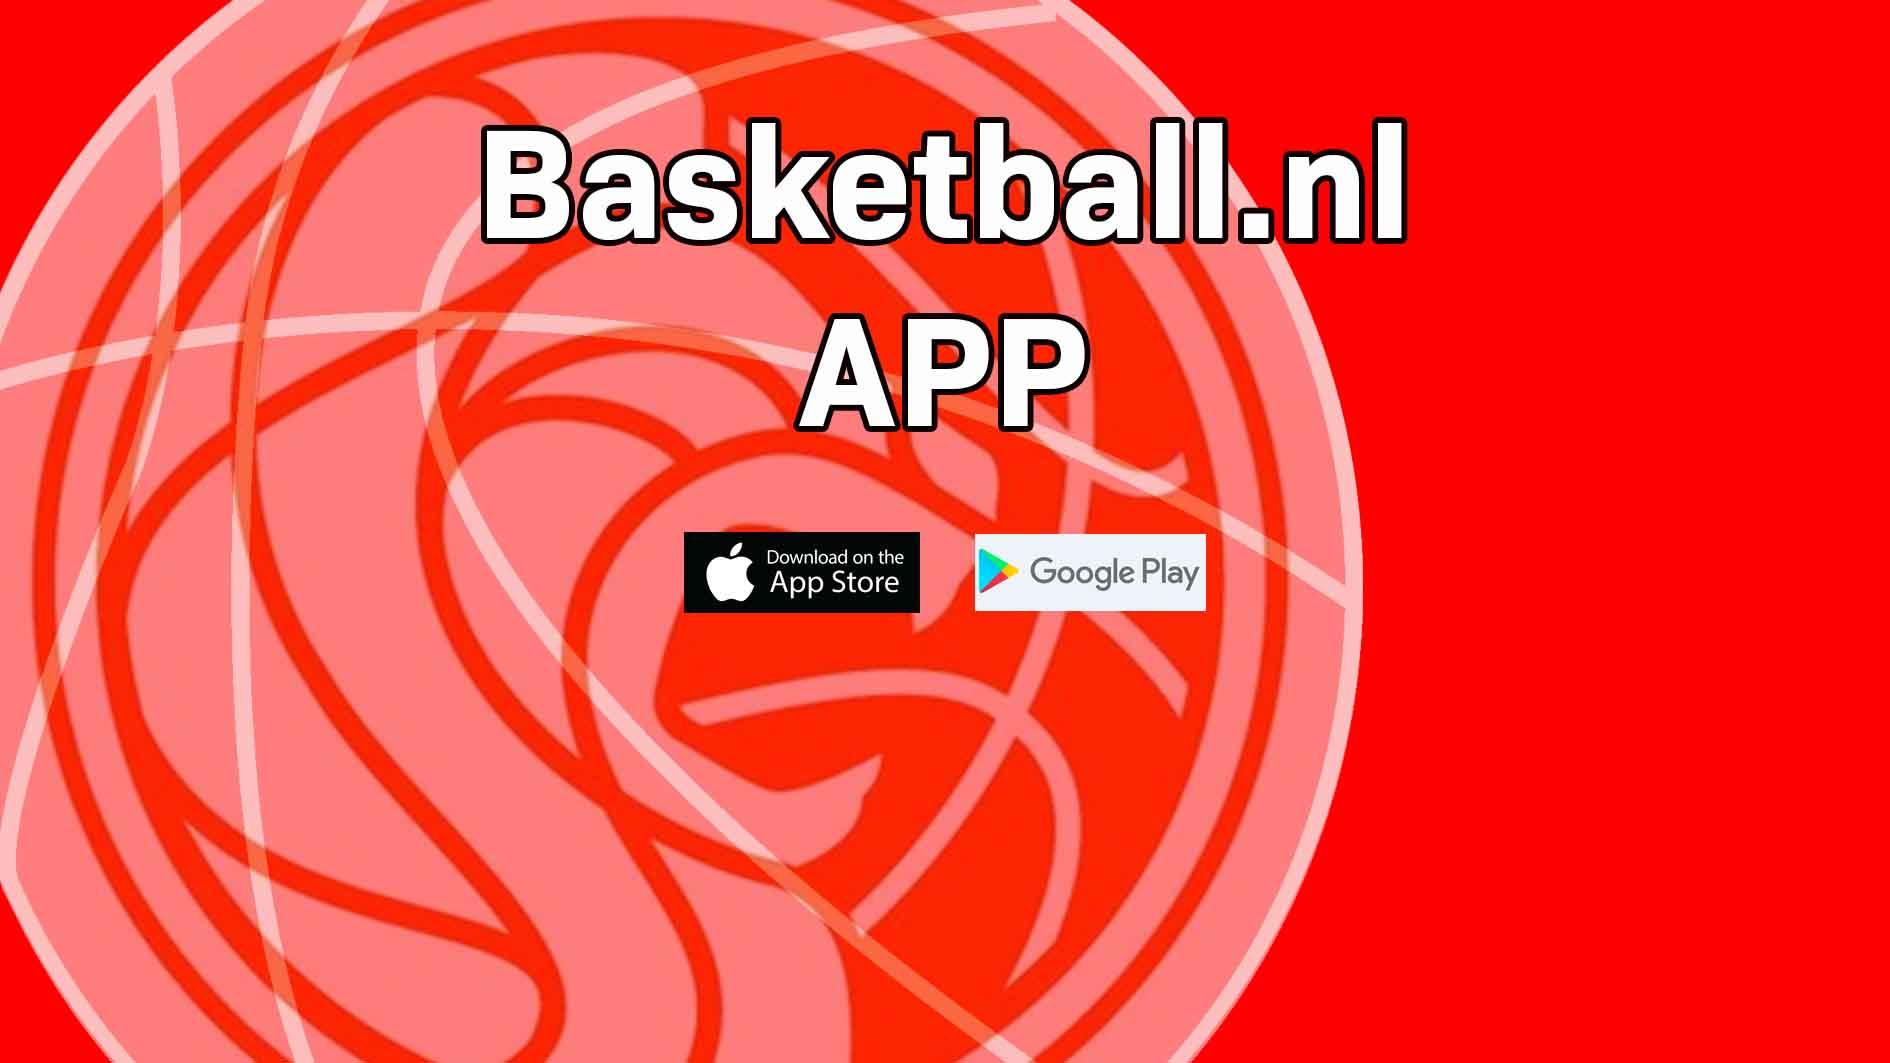 Basketball.nl Wedstrijd app